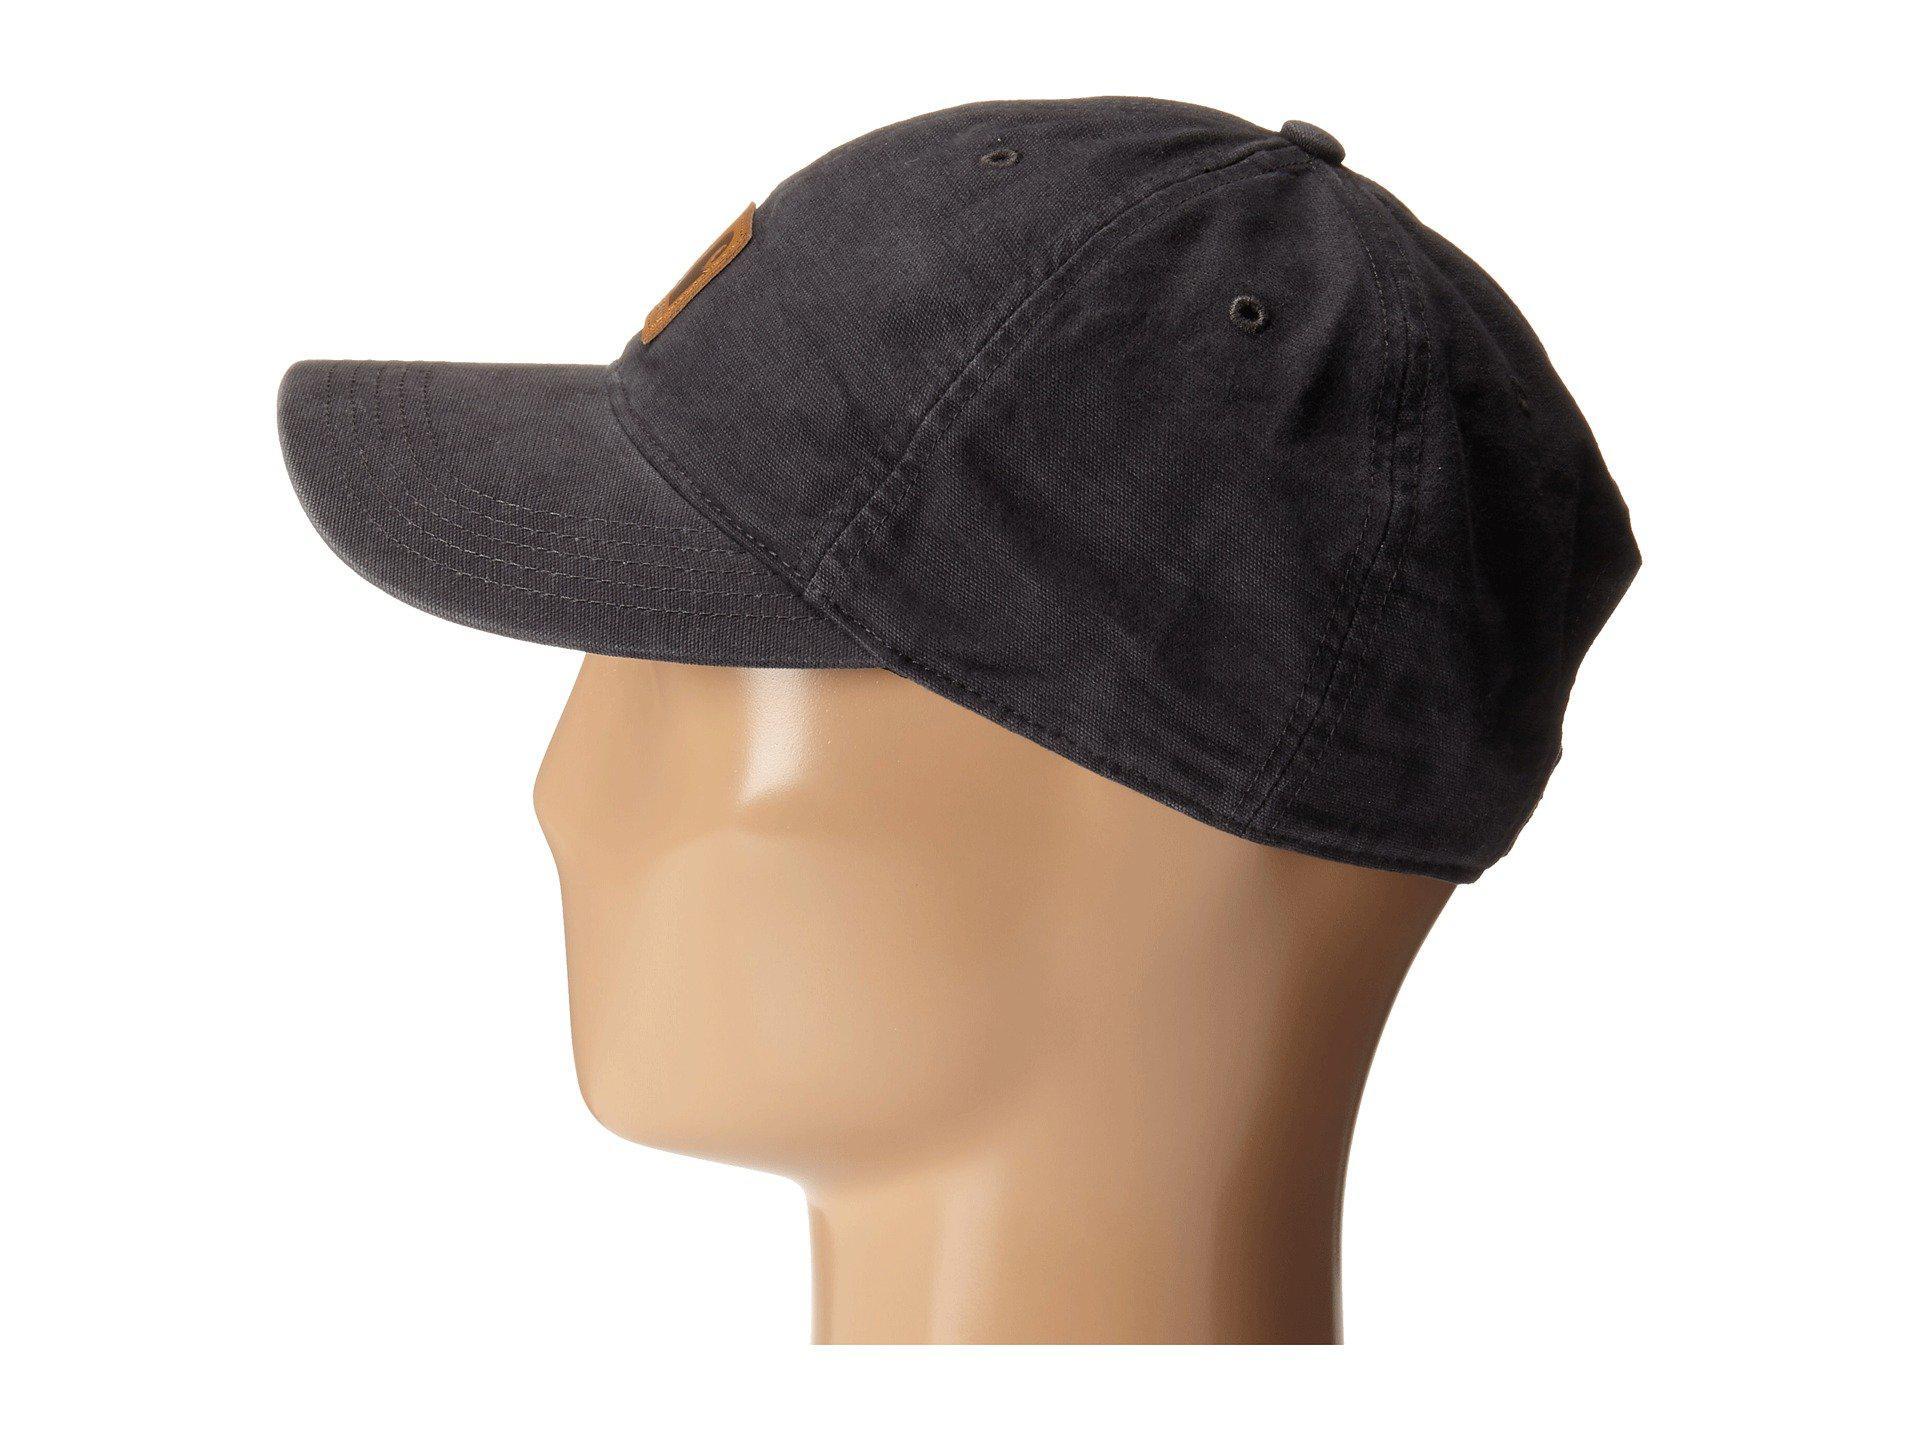 Lyst - Carhartt Odessa Cap (black) Baseball Caps in Black for Men fab8eb2bedb9